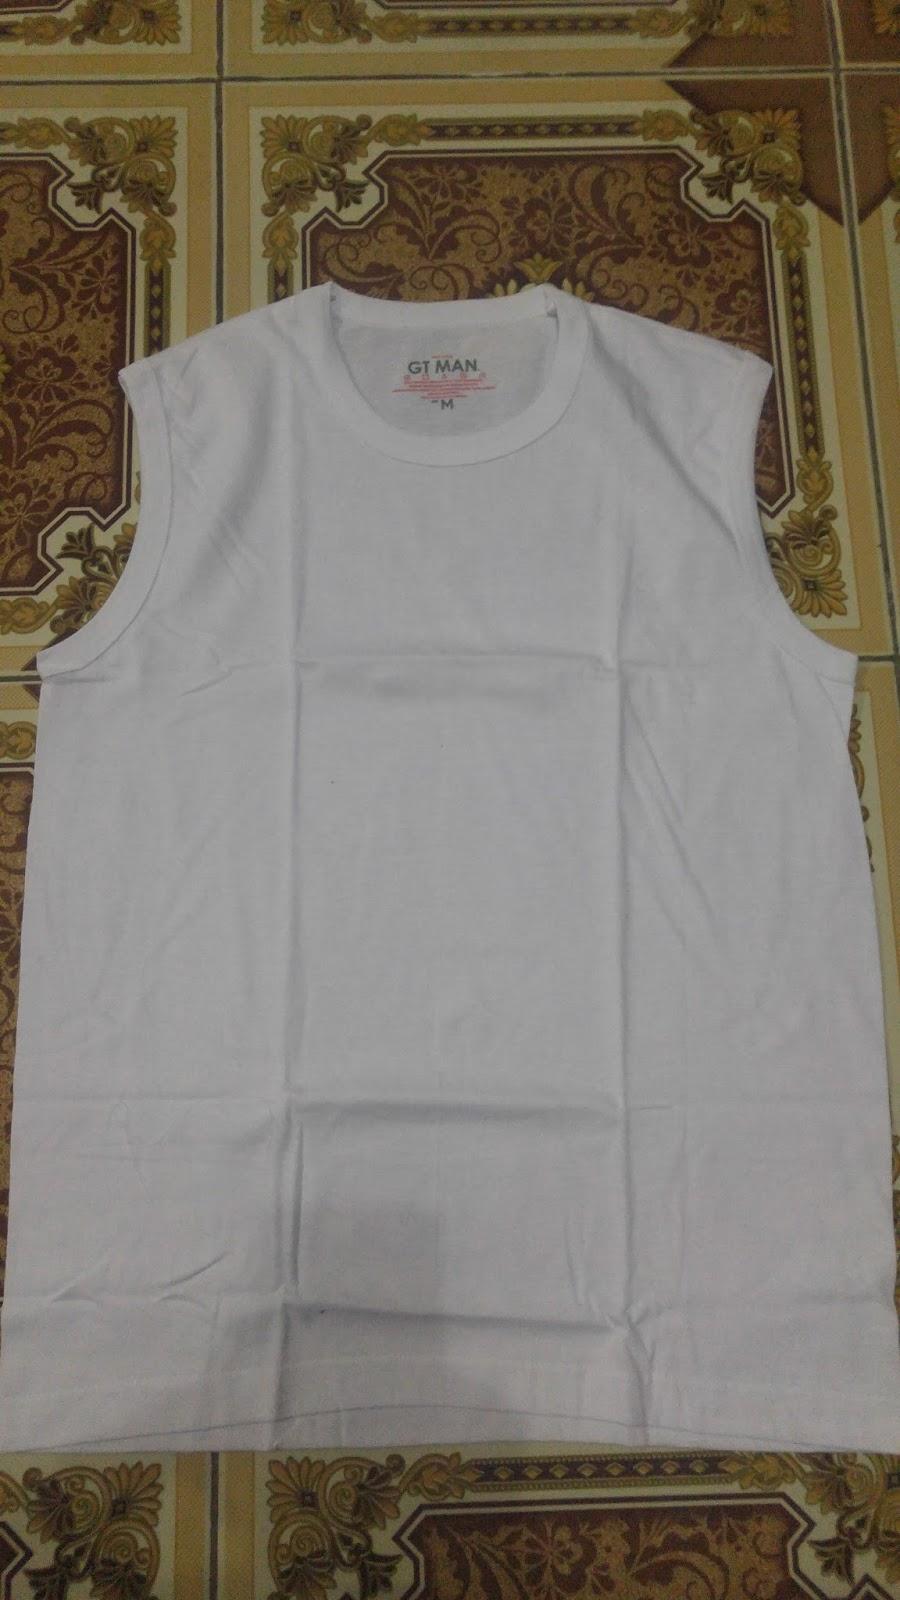 Singlet Gtman Tipe Gtlx Katalog Chamay Collection Pakaian Dalam Pria Kaos Oblong Gt Man Hitam Info Terbaru Silahkan Hubungi Bbm Da46d286 Wa 089607244167 Fb Ridwan Muhamad Saleh